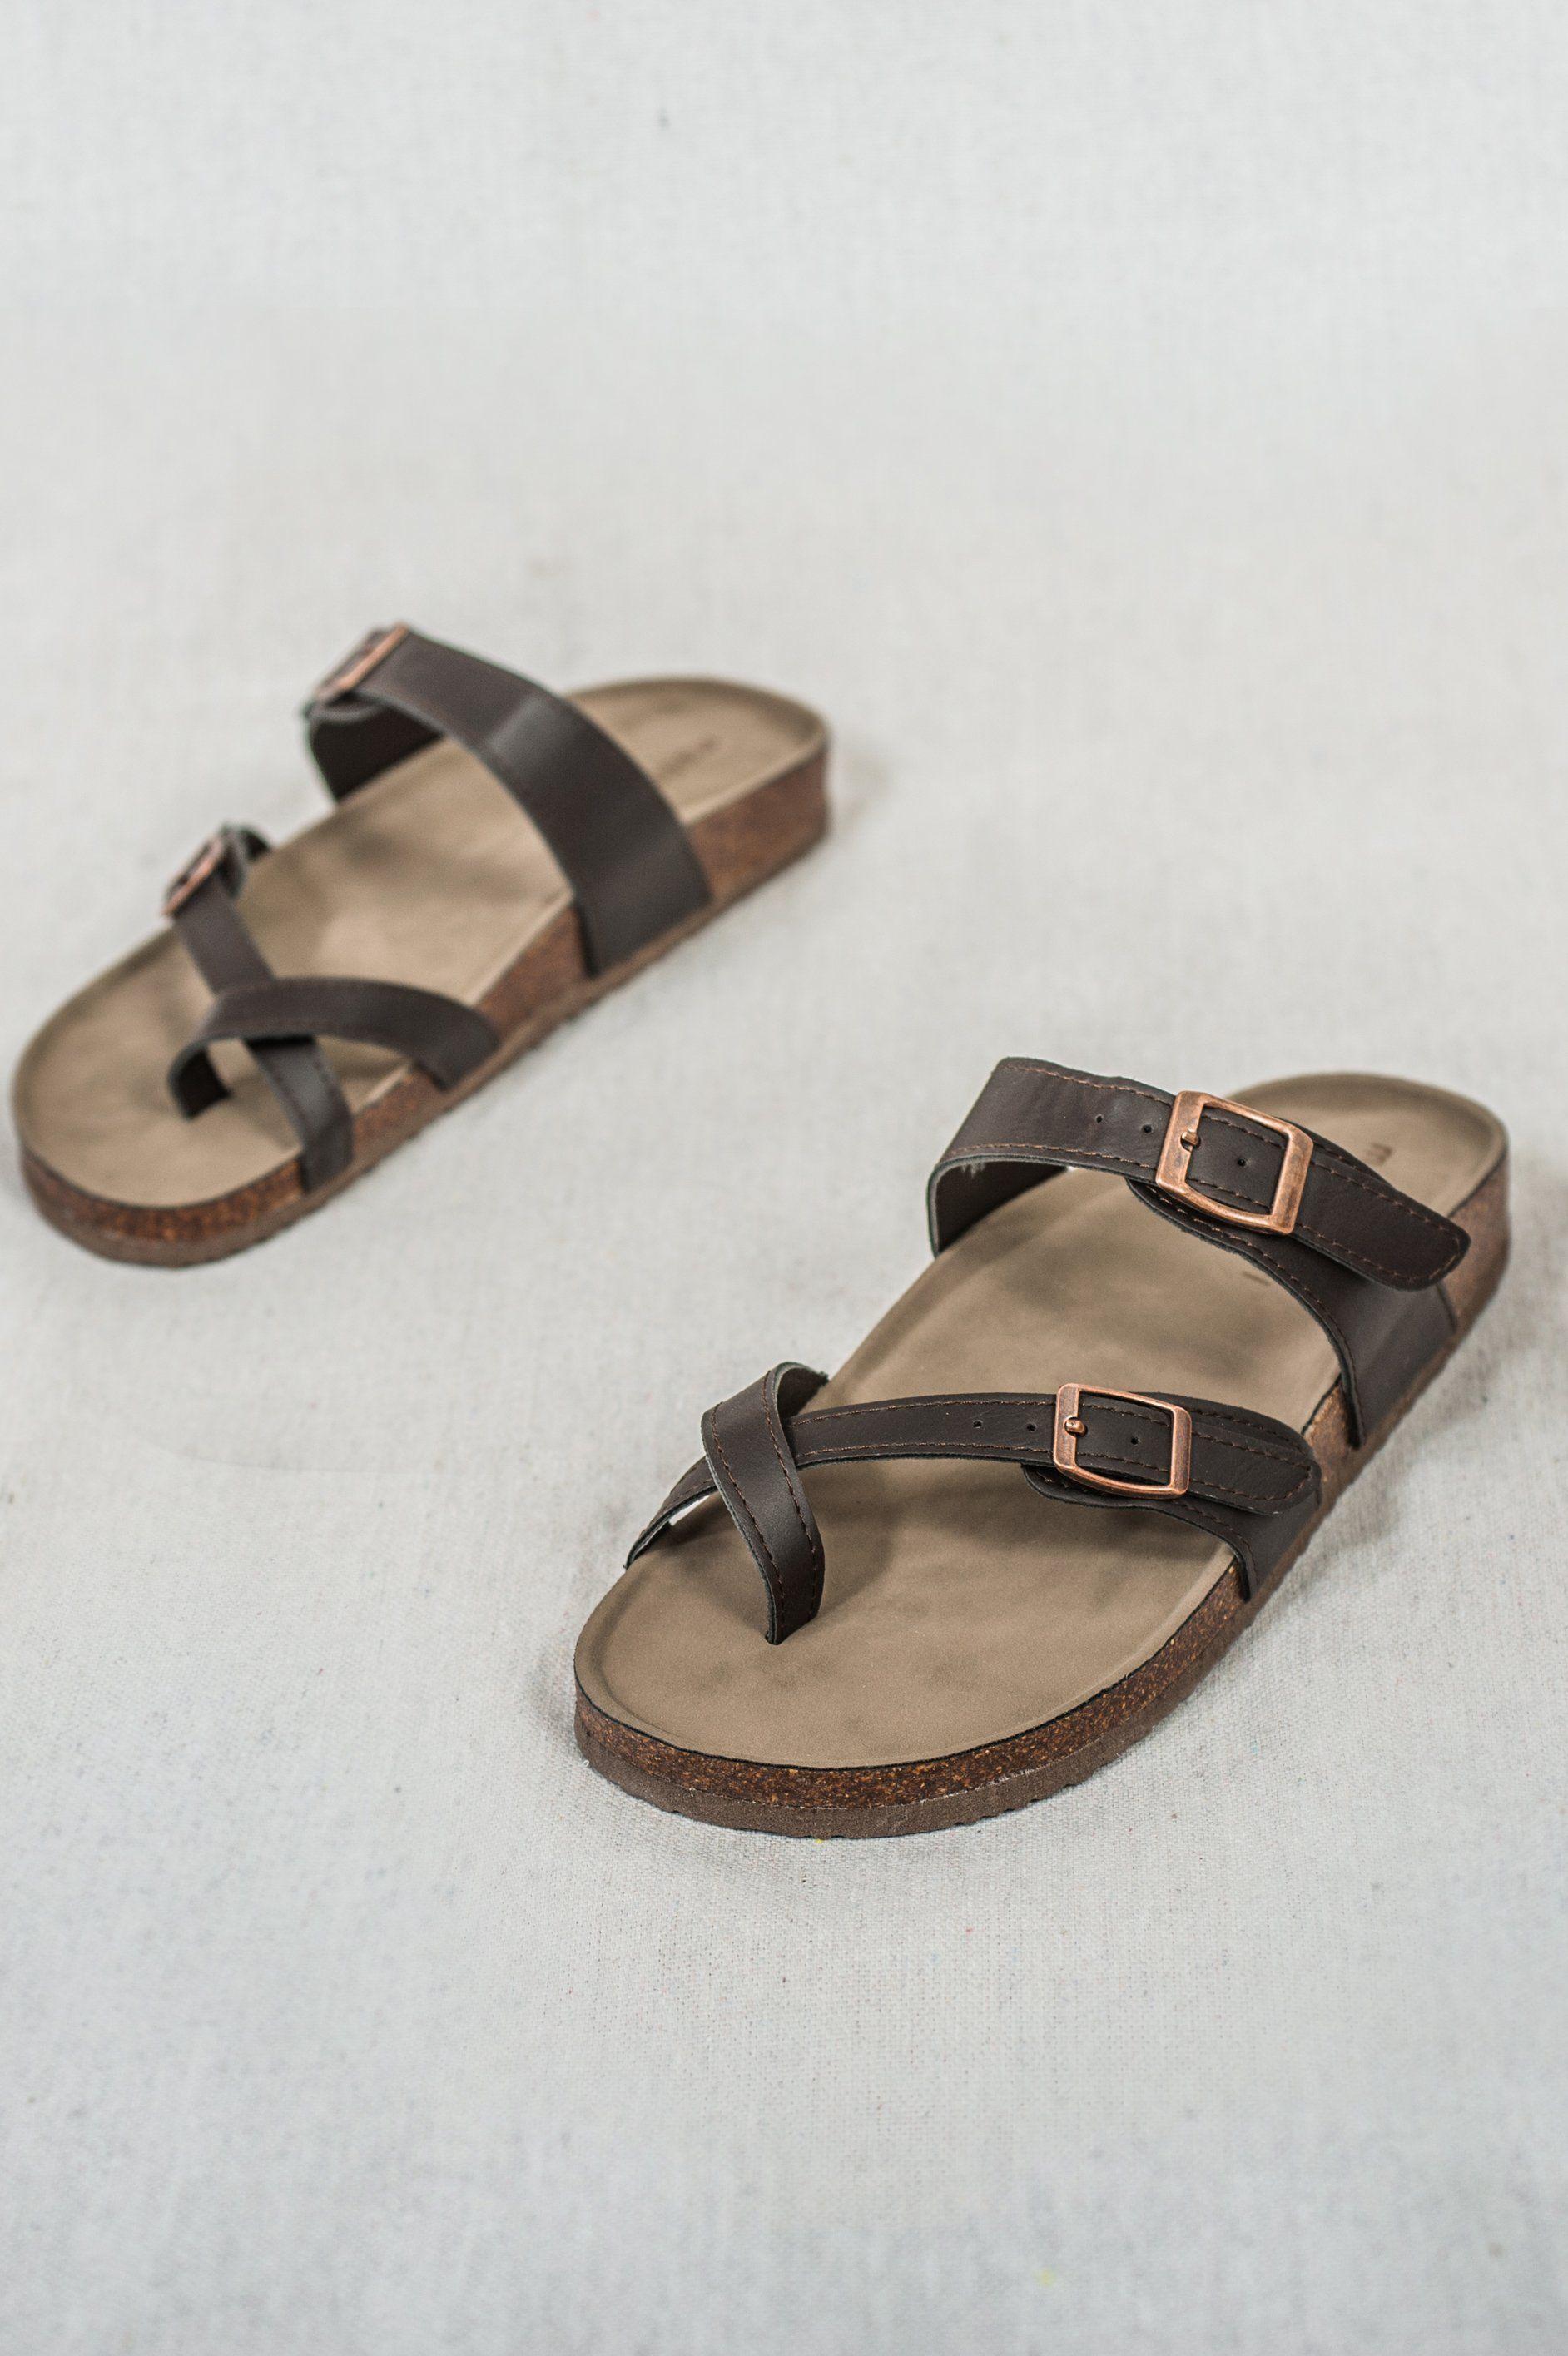 45cae355c Brycee Sandal - Women's Brown Cork Sole Toe Sandals, Birkenstocks, Knock  Off Birkenstock, Cute Brown Leather Sandals, Vegan Leather Women's Sandals,  ...